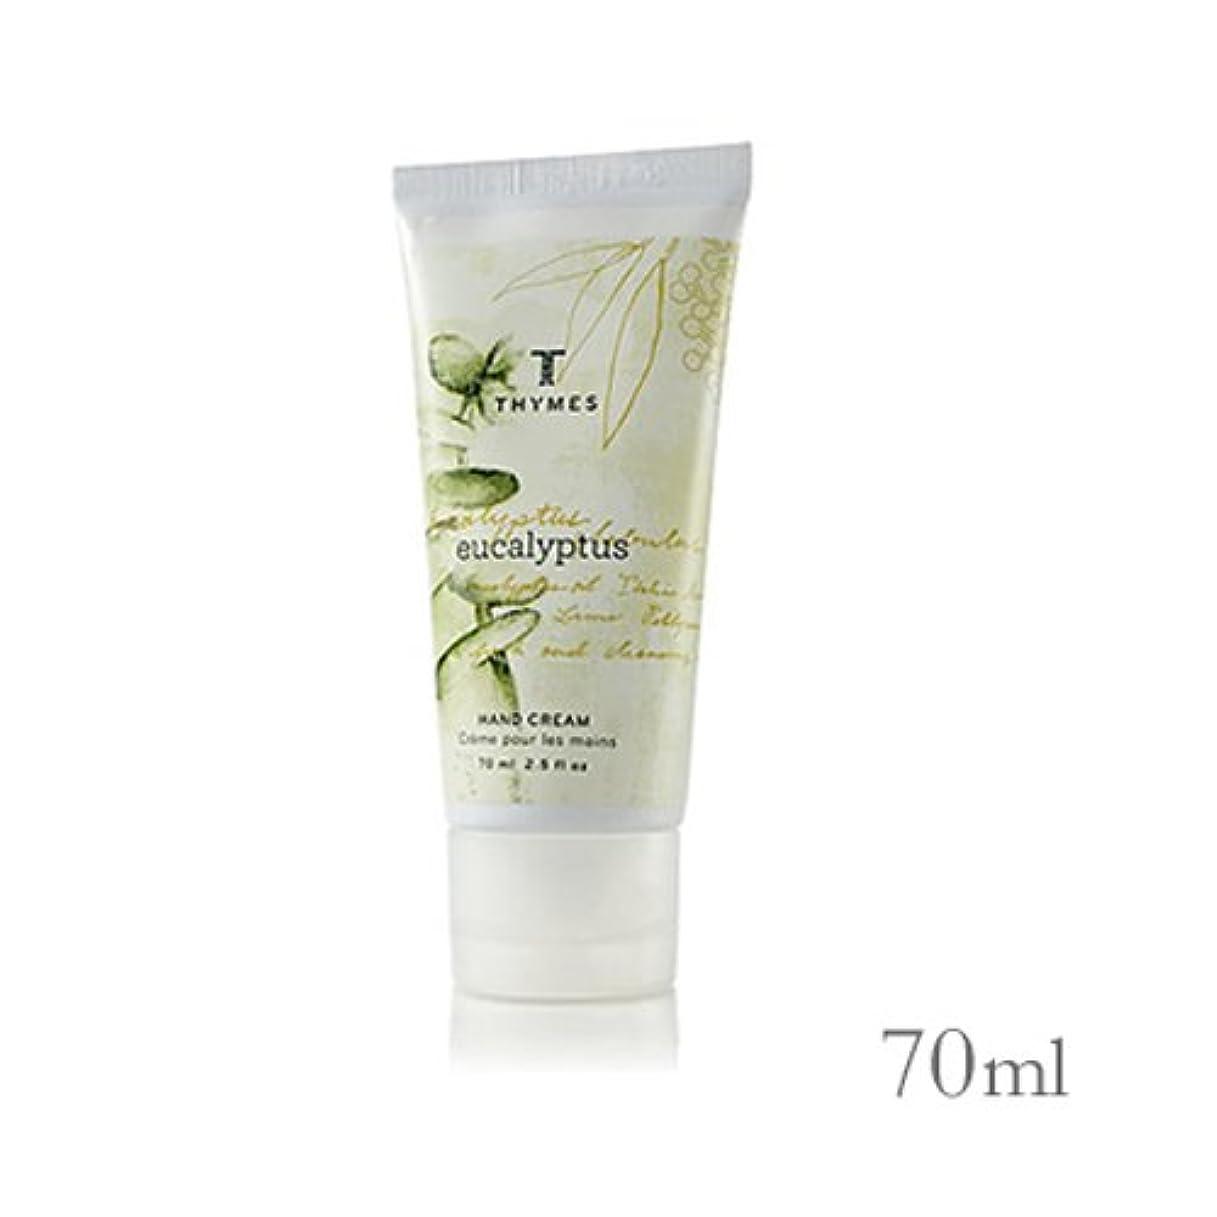 THYMES タイムズ ハンドクリーム 70ml ユーカリ Hand Cream 2.5 fl oz Eucalyptus [並行輸入品]